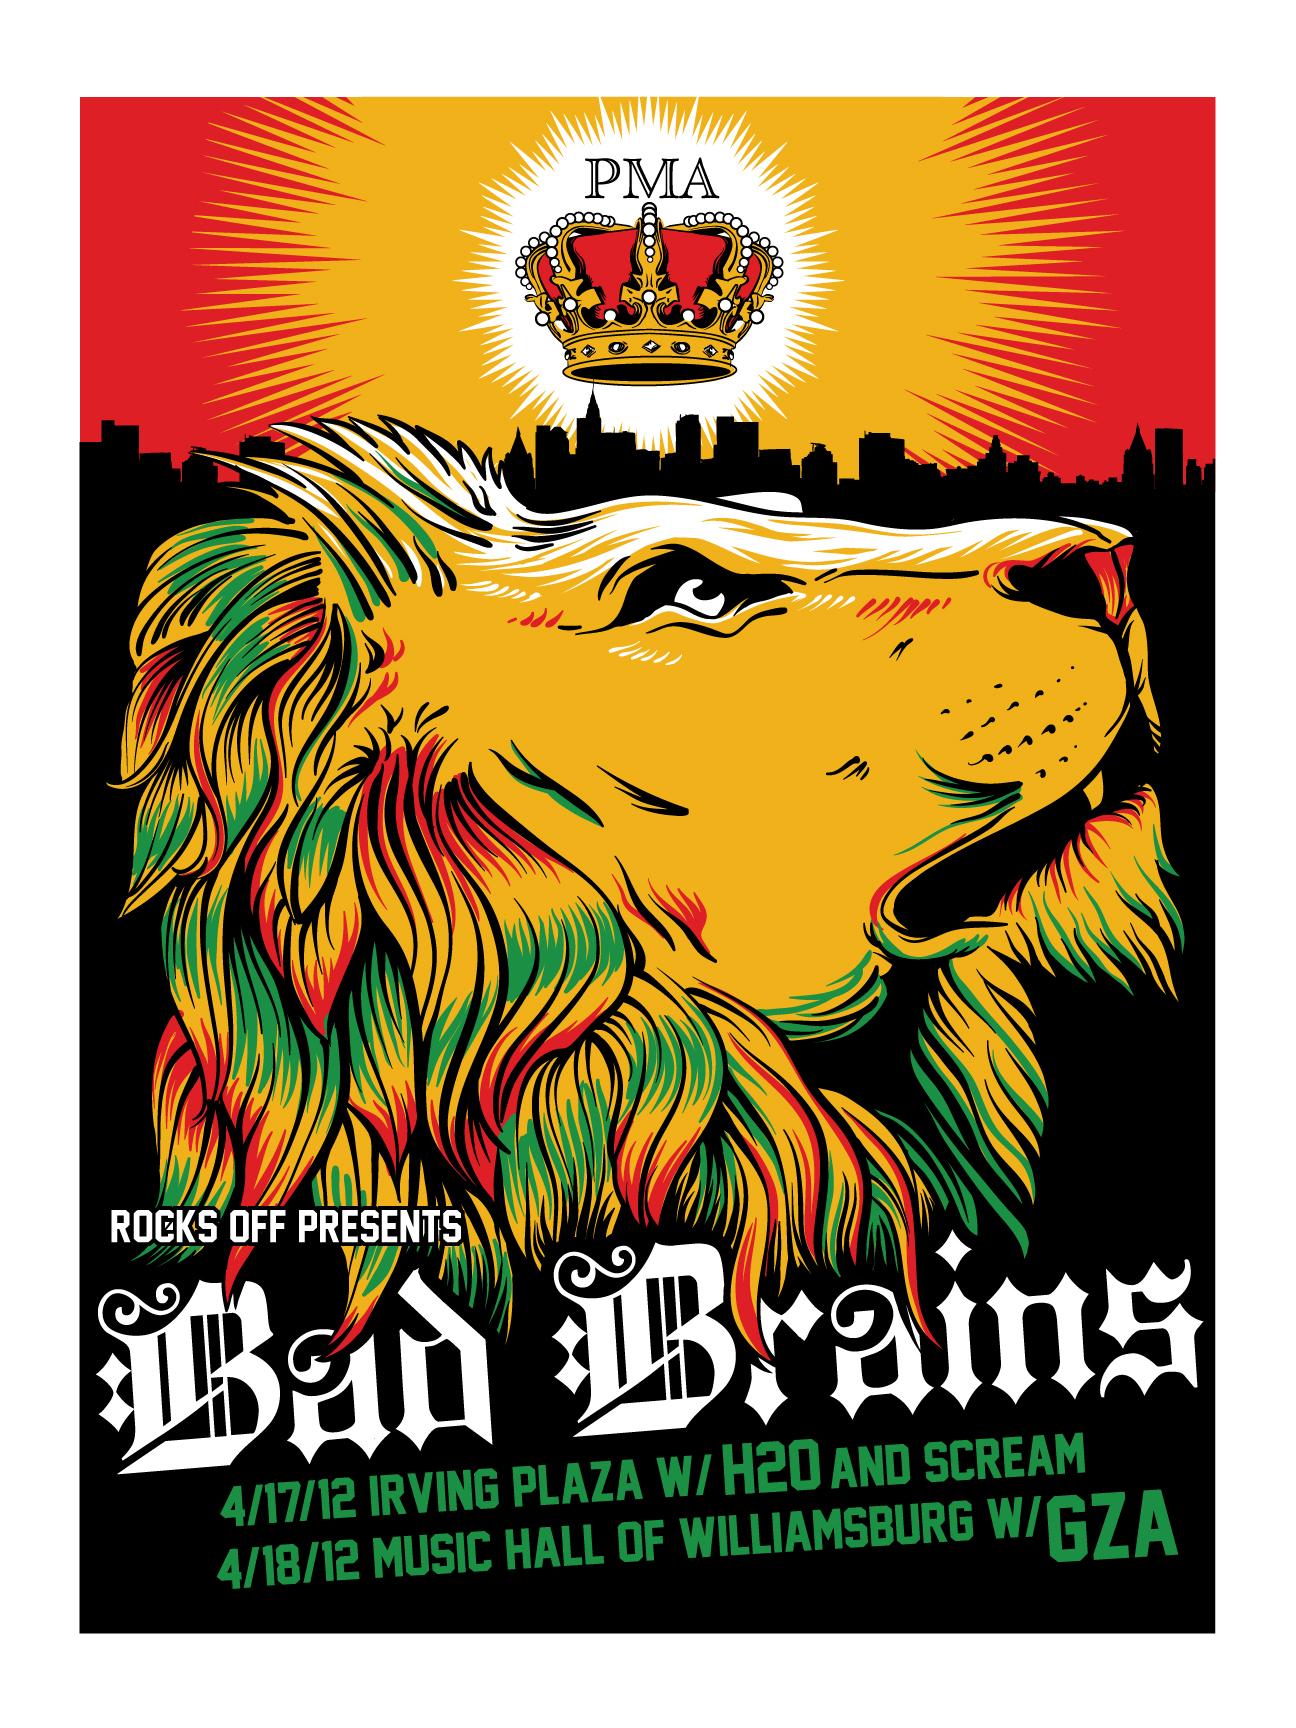 badBrains4-17-12.jpg